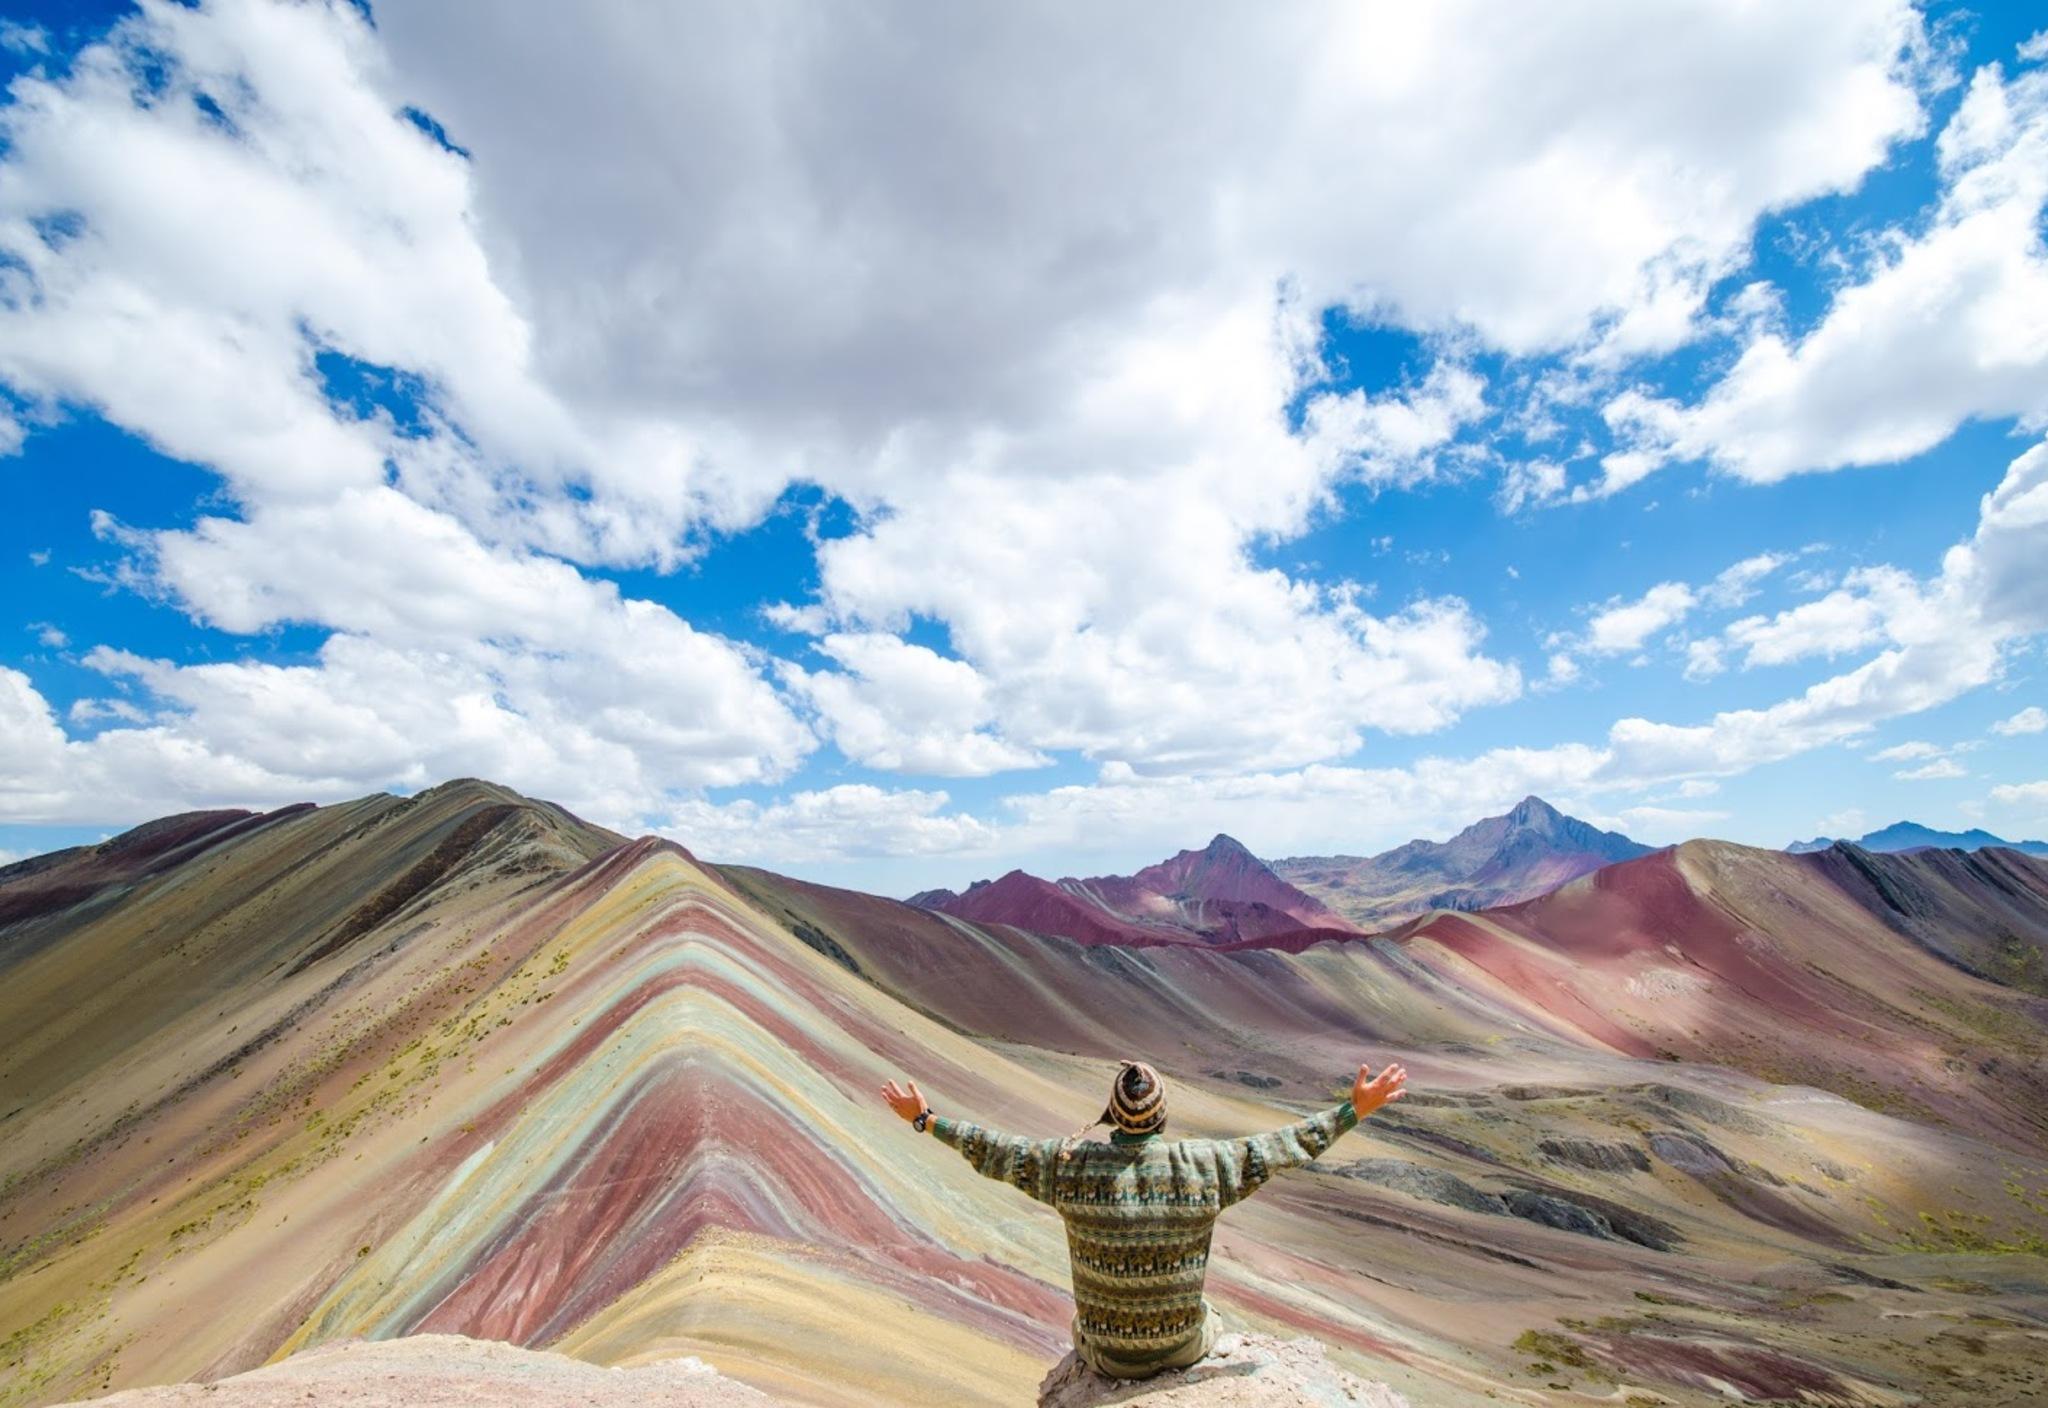 Rainbow Mountain, Peru |B Morris